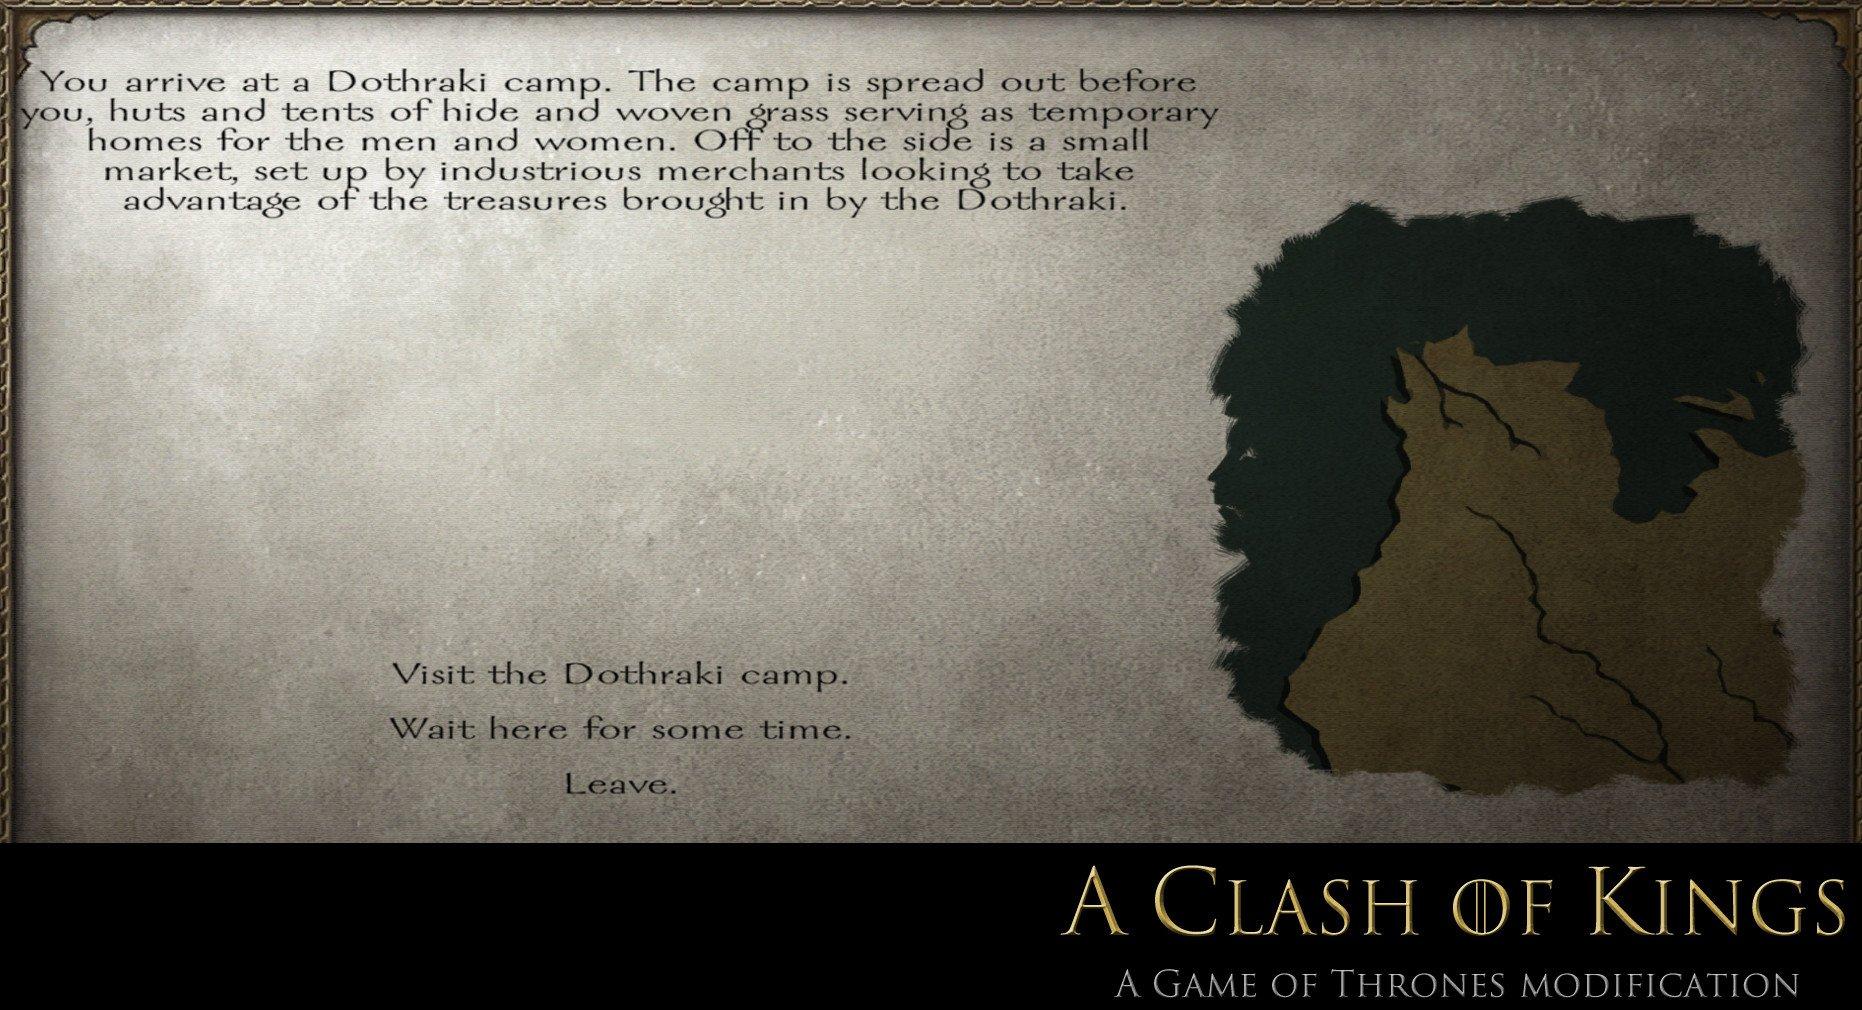 Game Of Thrones Menu Template Dothraki Template Image A Clash Of Kings Game Of